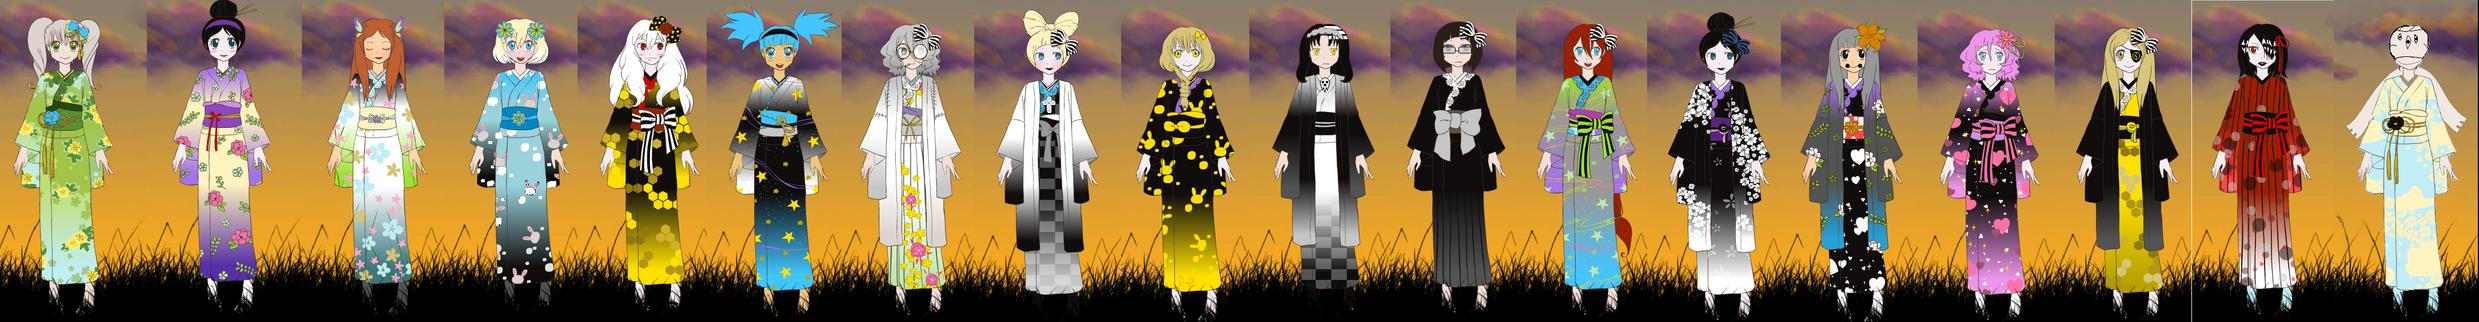 Soul Eater Kimono Girls by samfly02mim